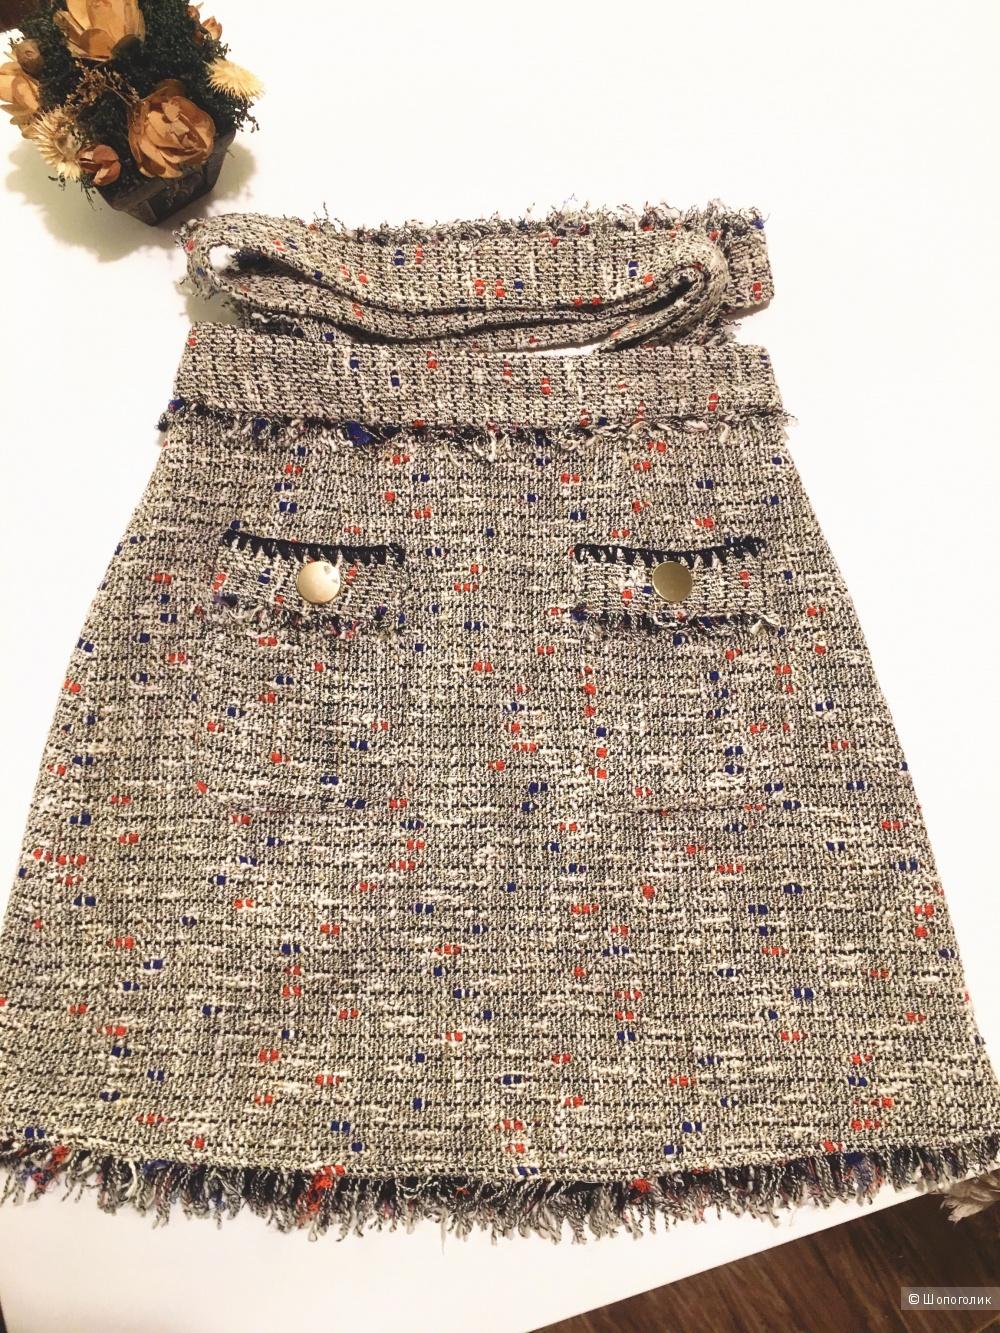 Мини-юбка из твида ZARA, размер XS